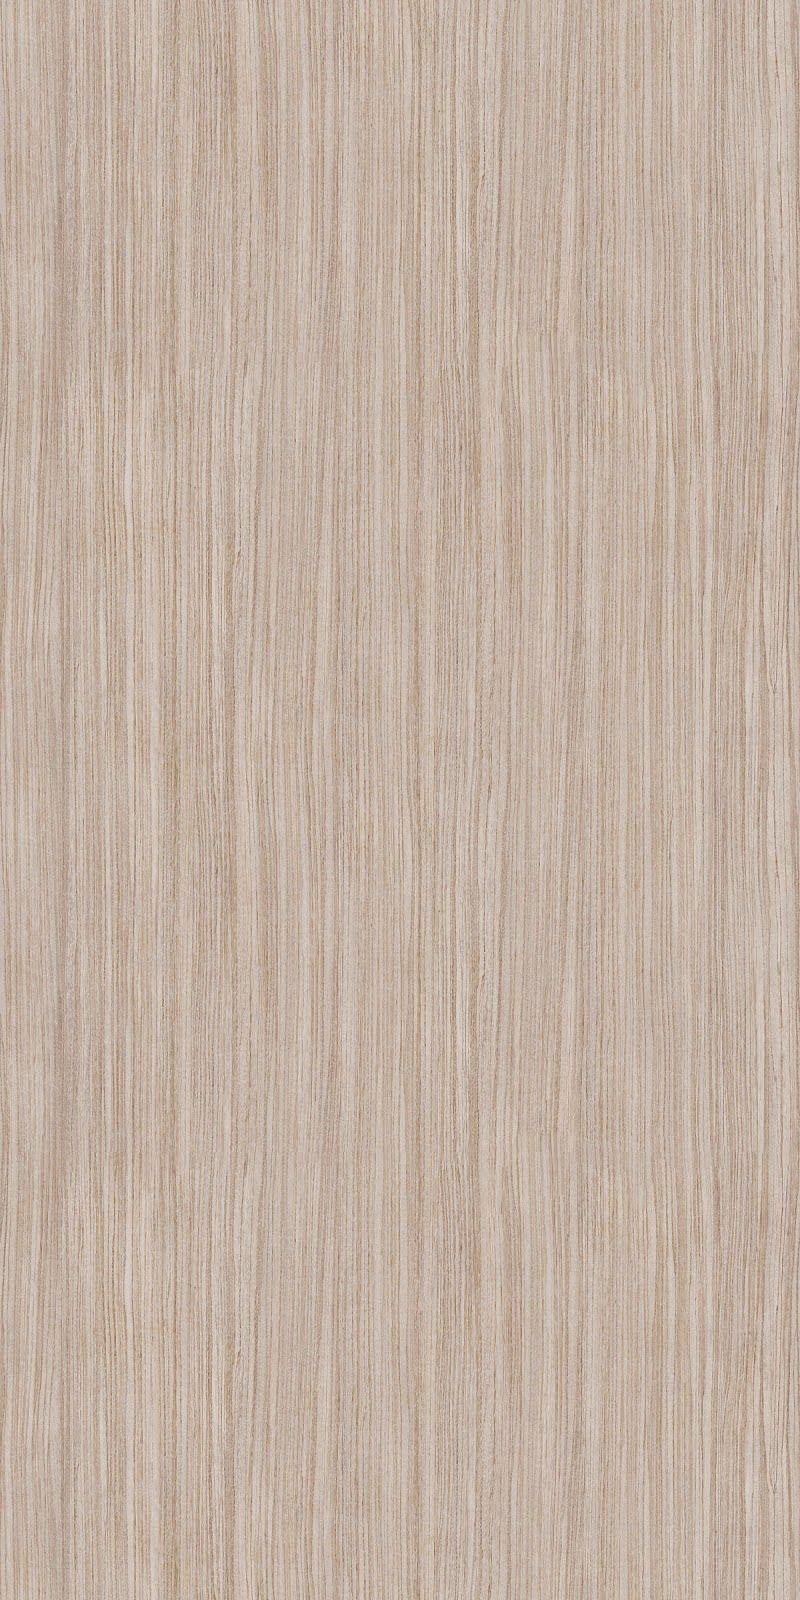 wood laminates seamless fine wood laminate texture + (maps) | texturise OXYTYFG